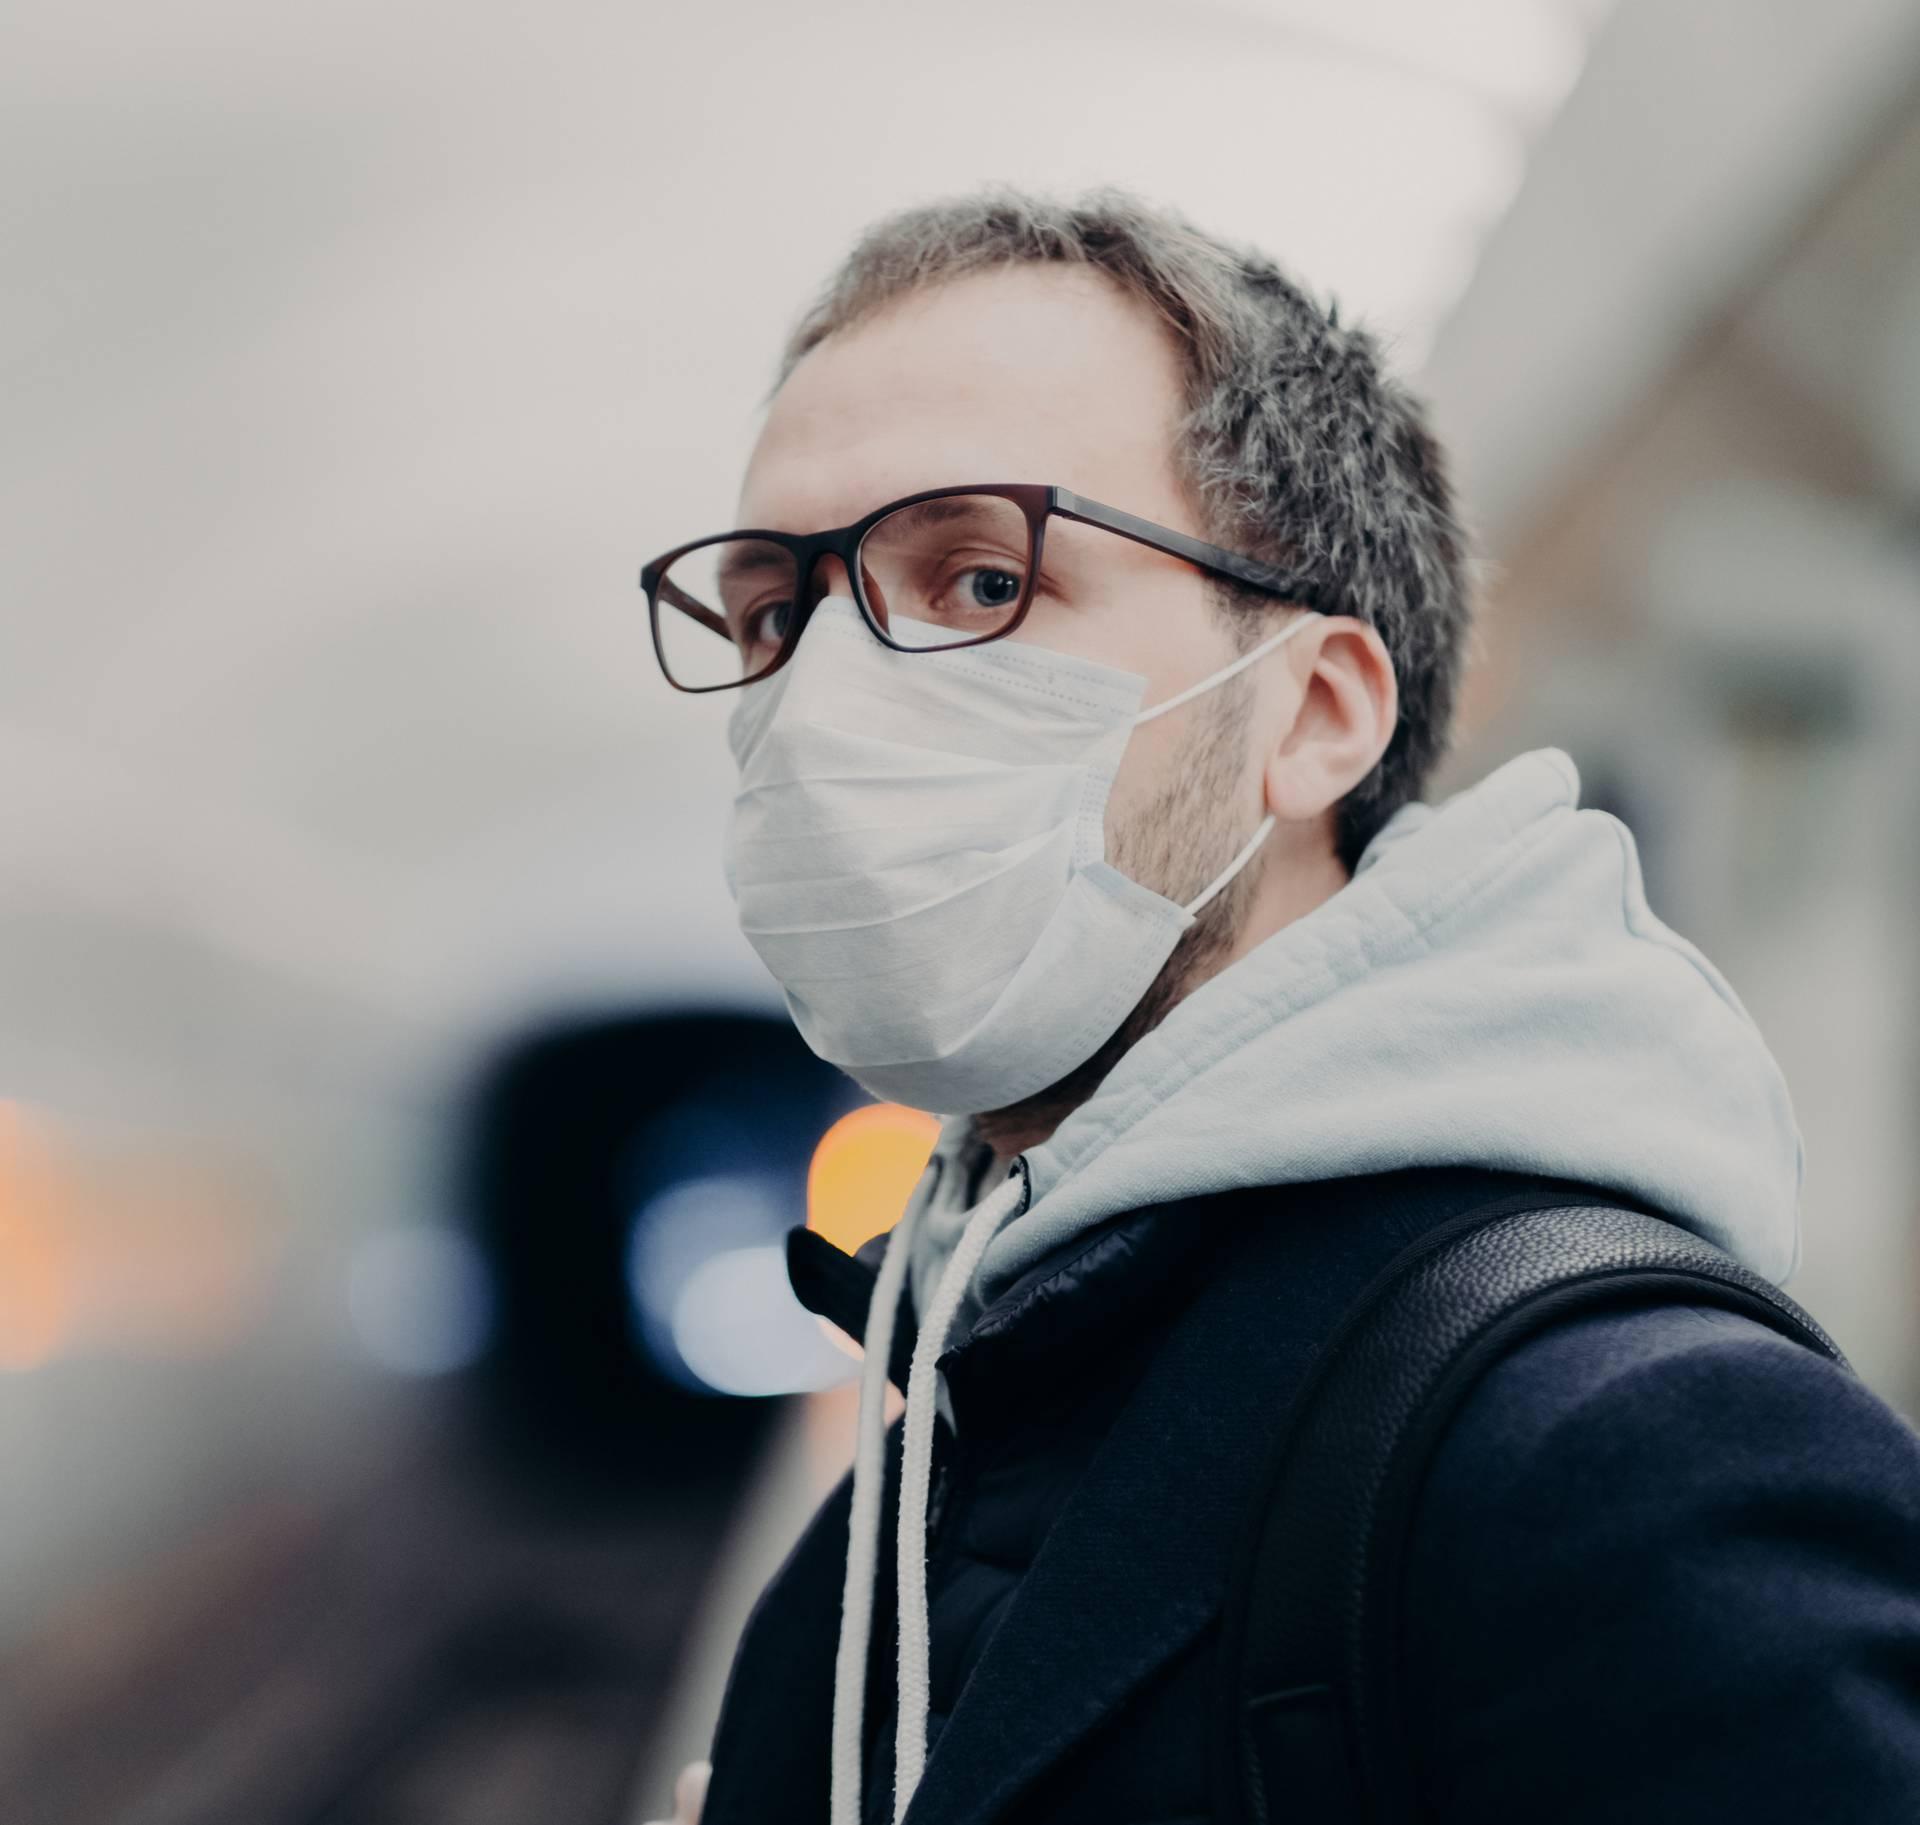 Maska i naočale: Savjeti kako da vam se stakla ne zamagle